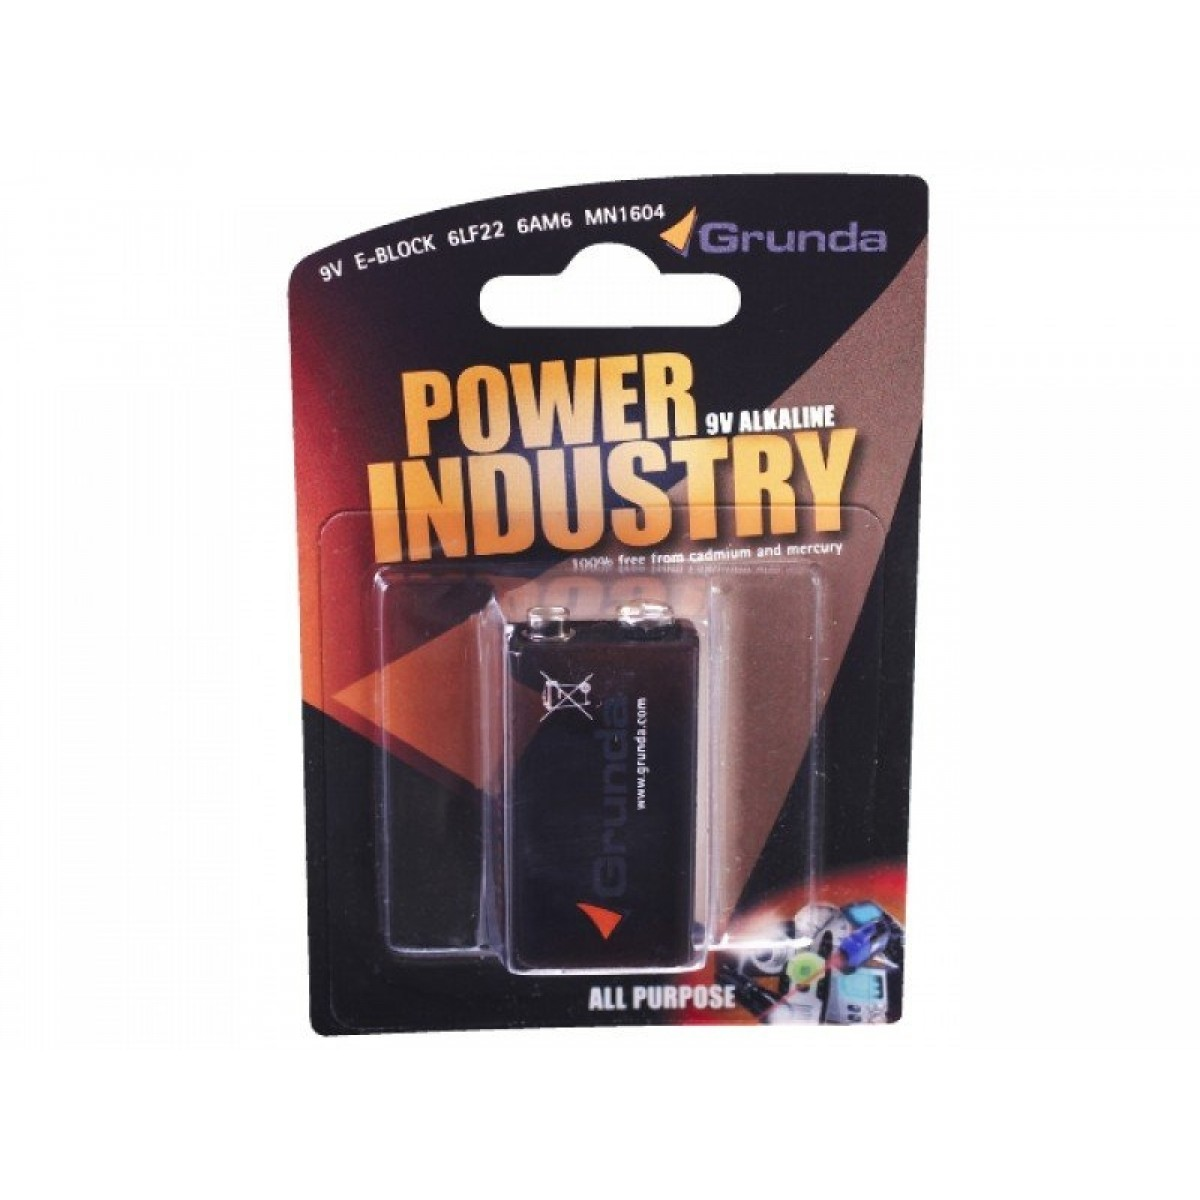 Batteri 1 stk alkaline 9V-31